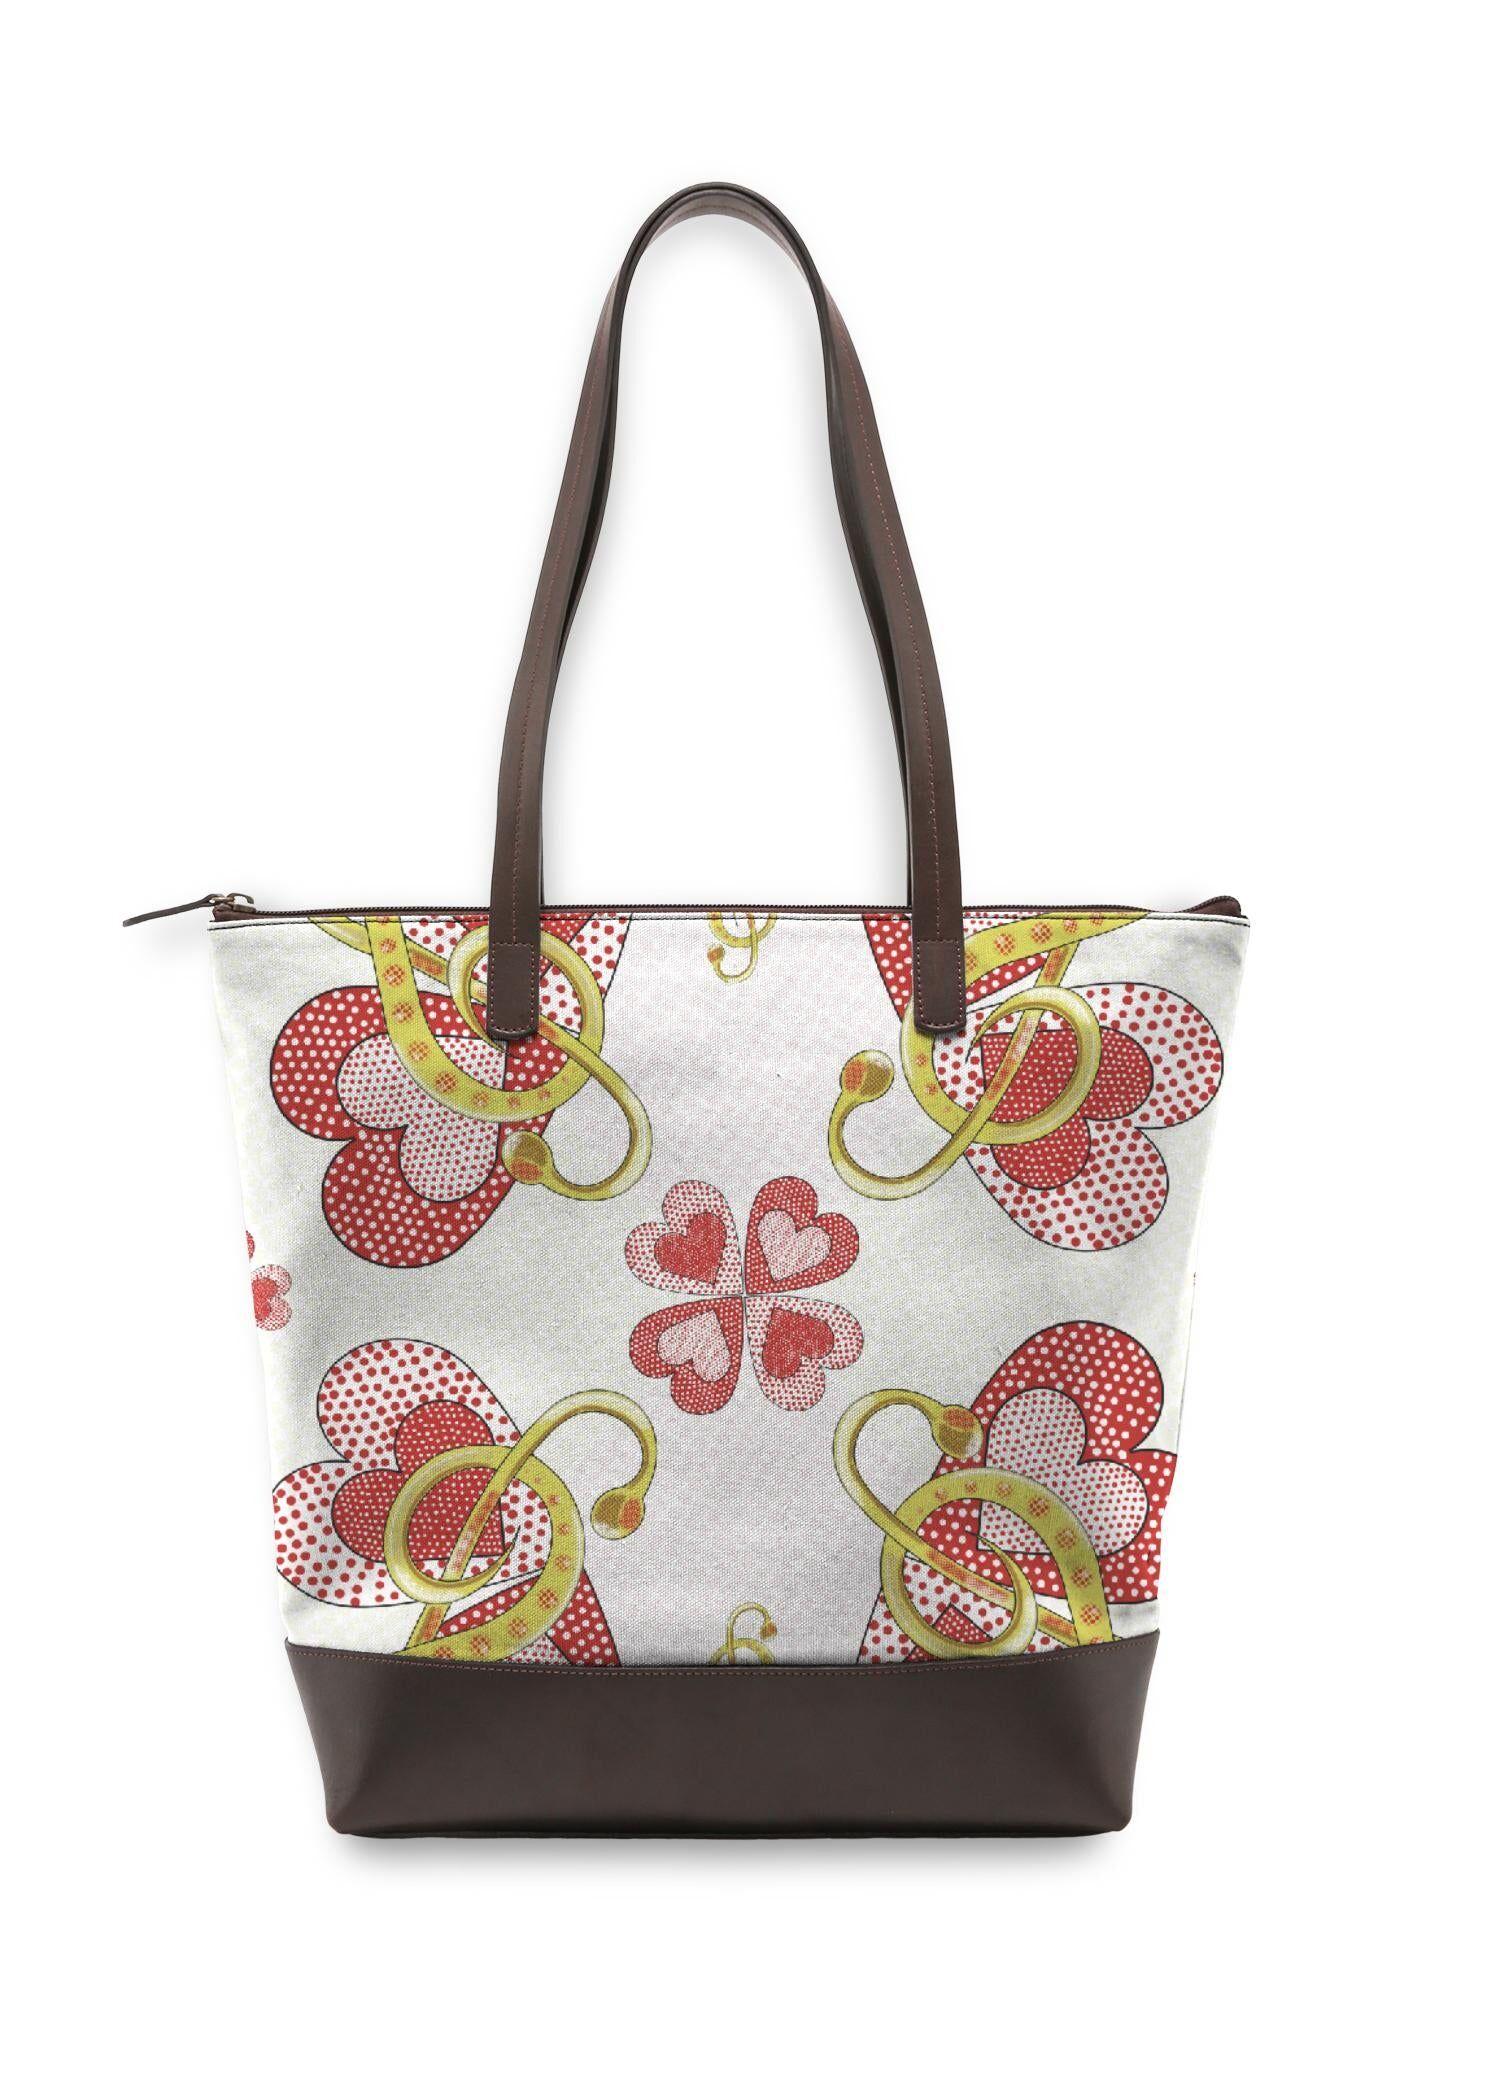 VIDA Statement Bag - Music by VIDA Original Artist  - Size: One Size